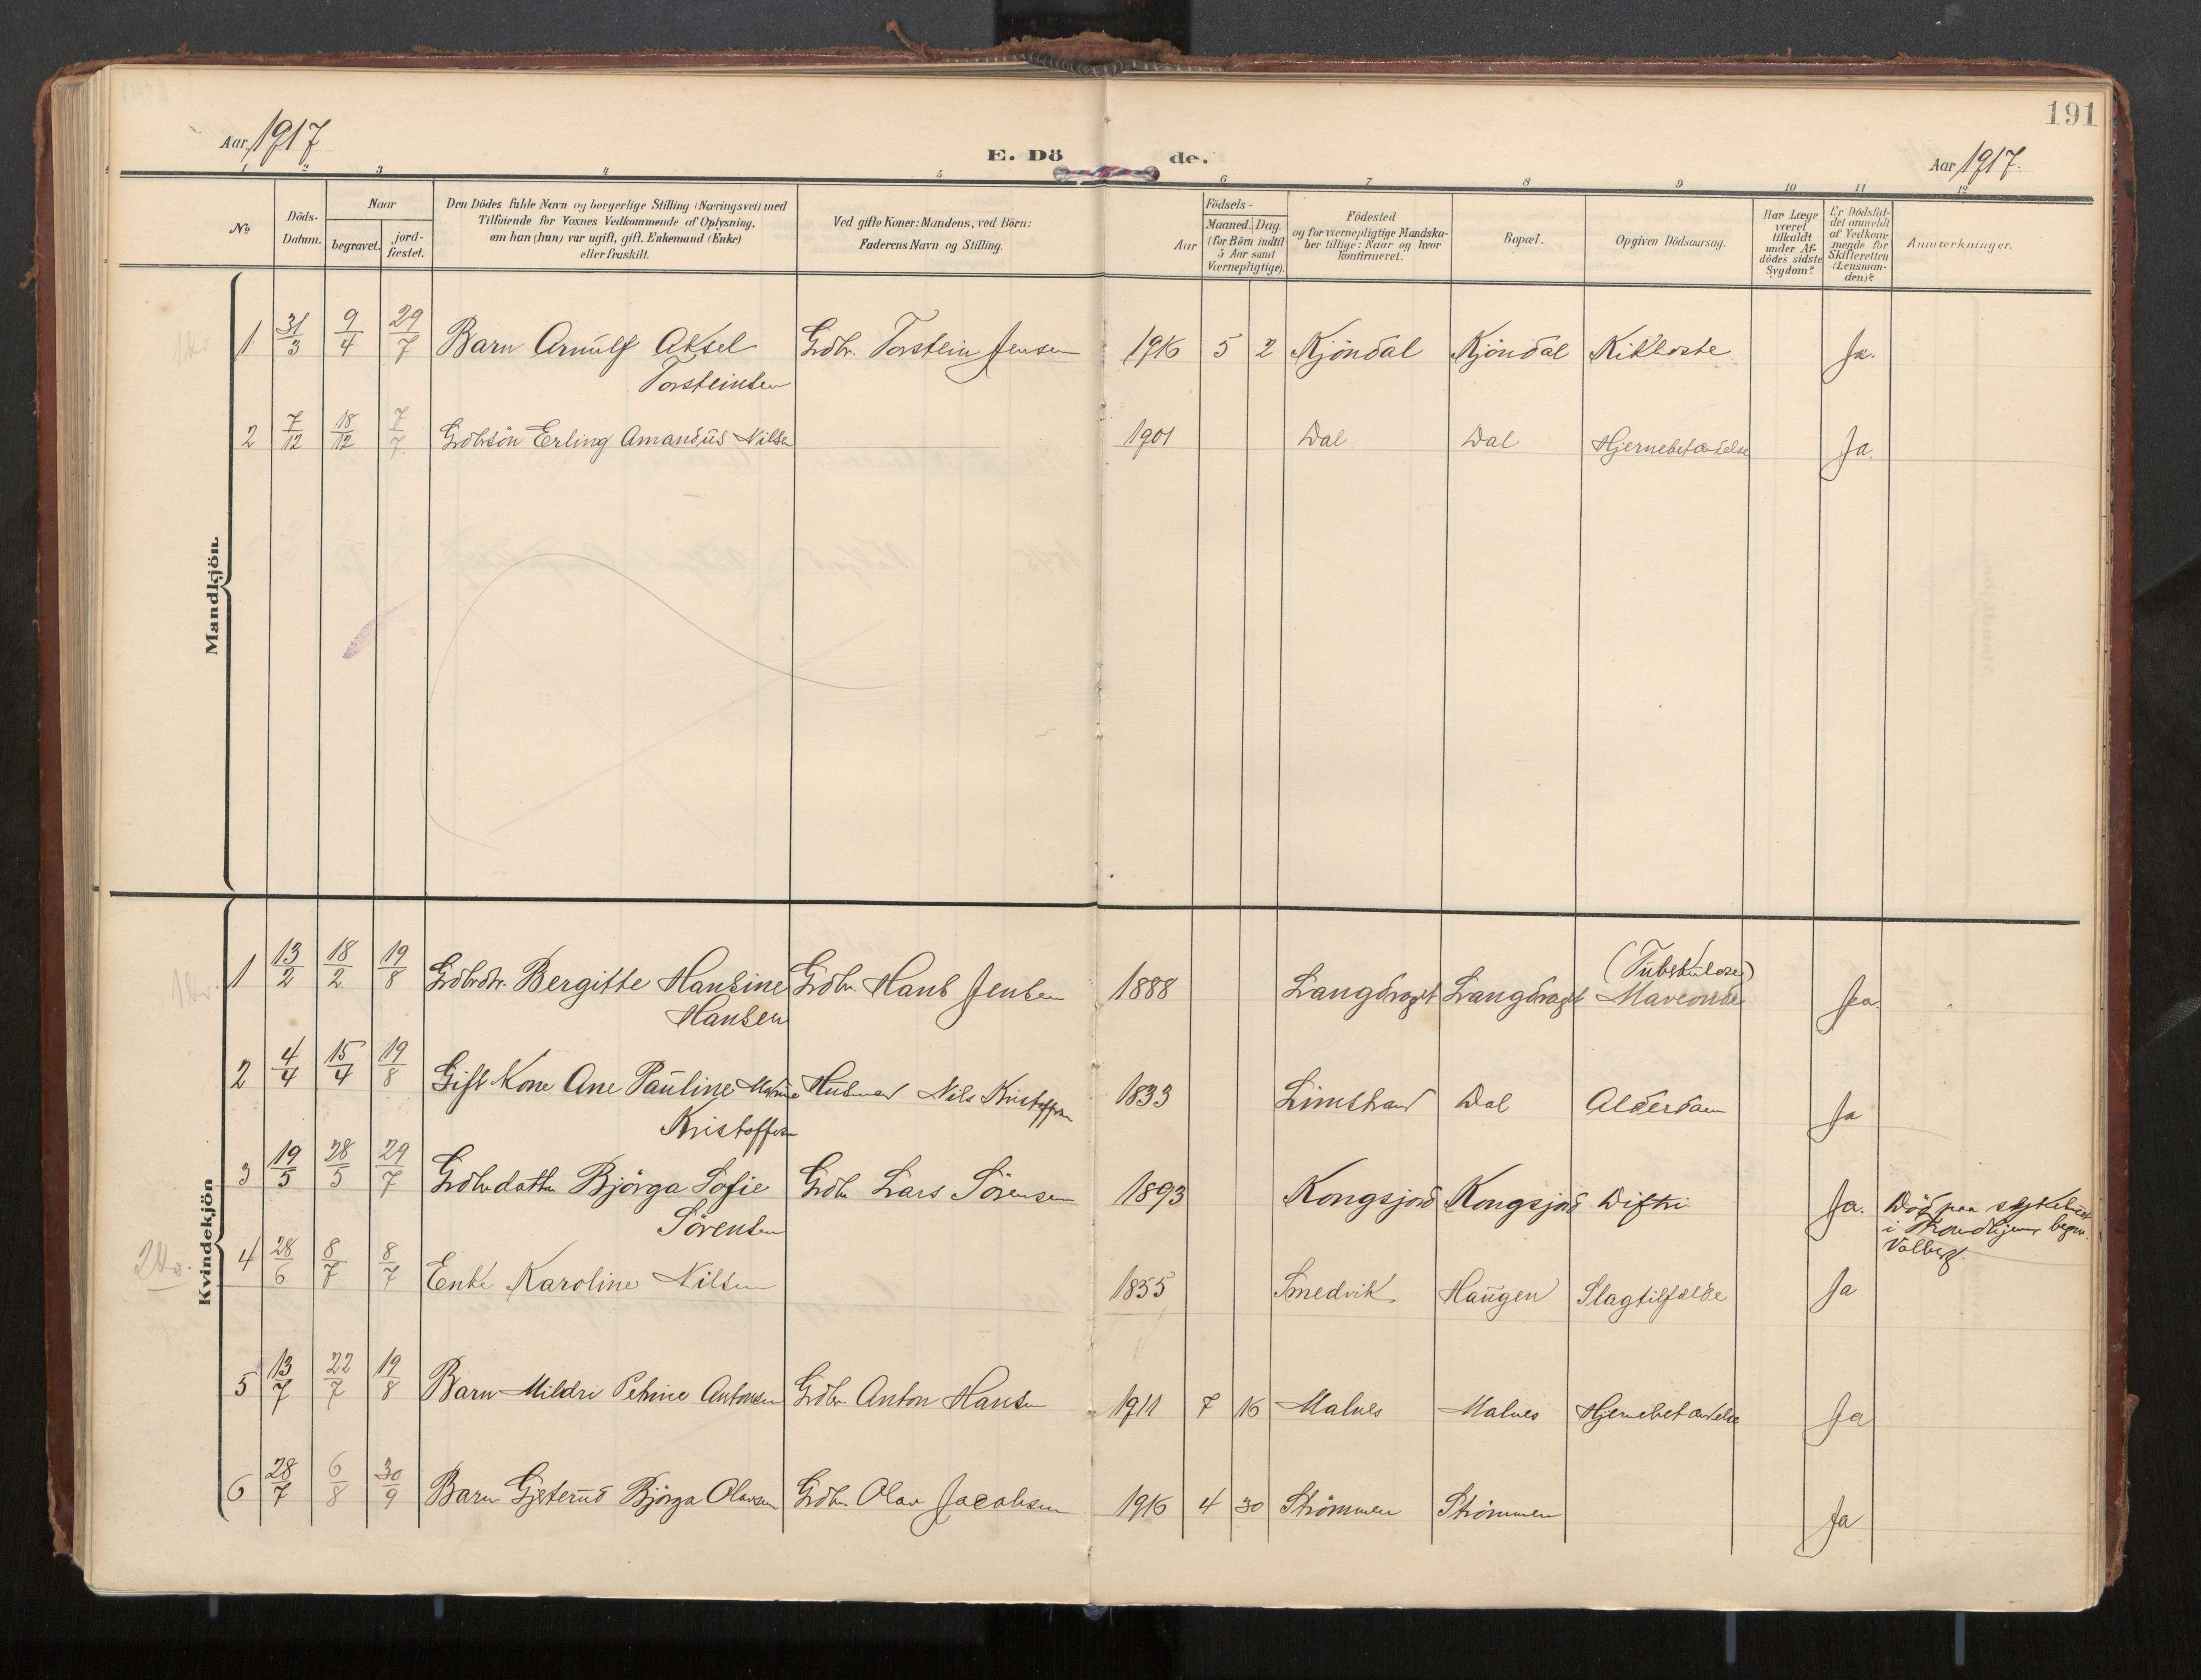 SAT, Ministerialprotokoller, klokkerbøker og fødselsregistre - Nordland, 884/L1194: Ministerialbok nr. 884A02, 1906-1937, s. 191